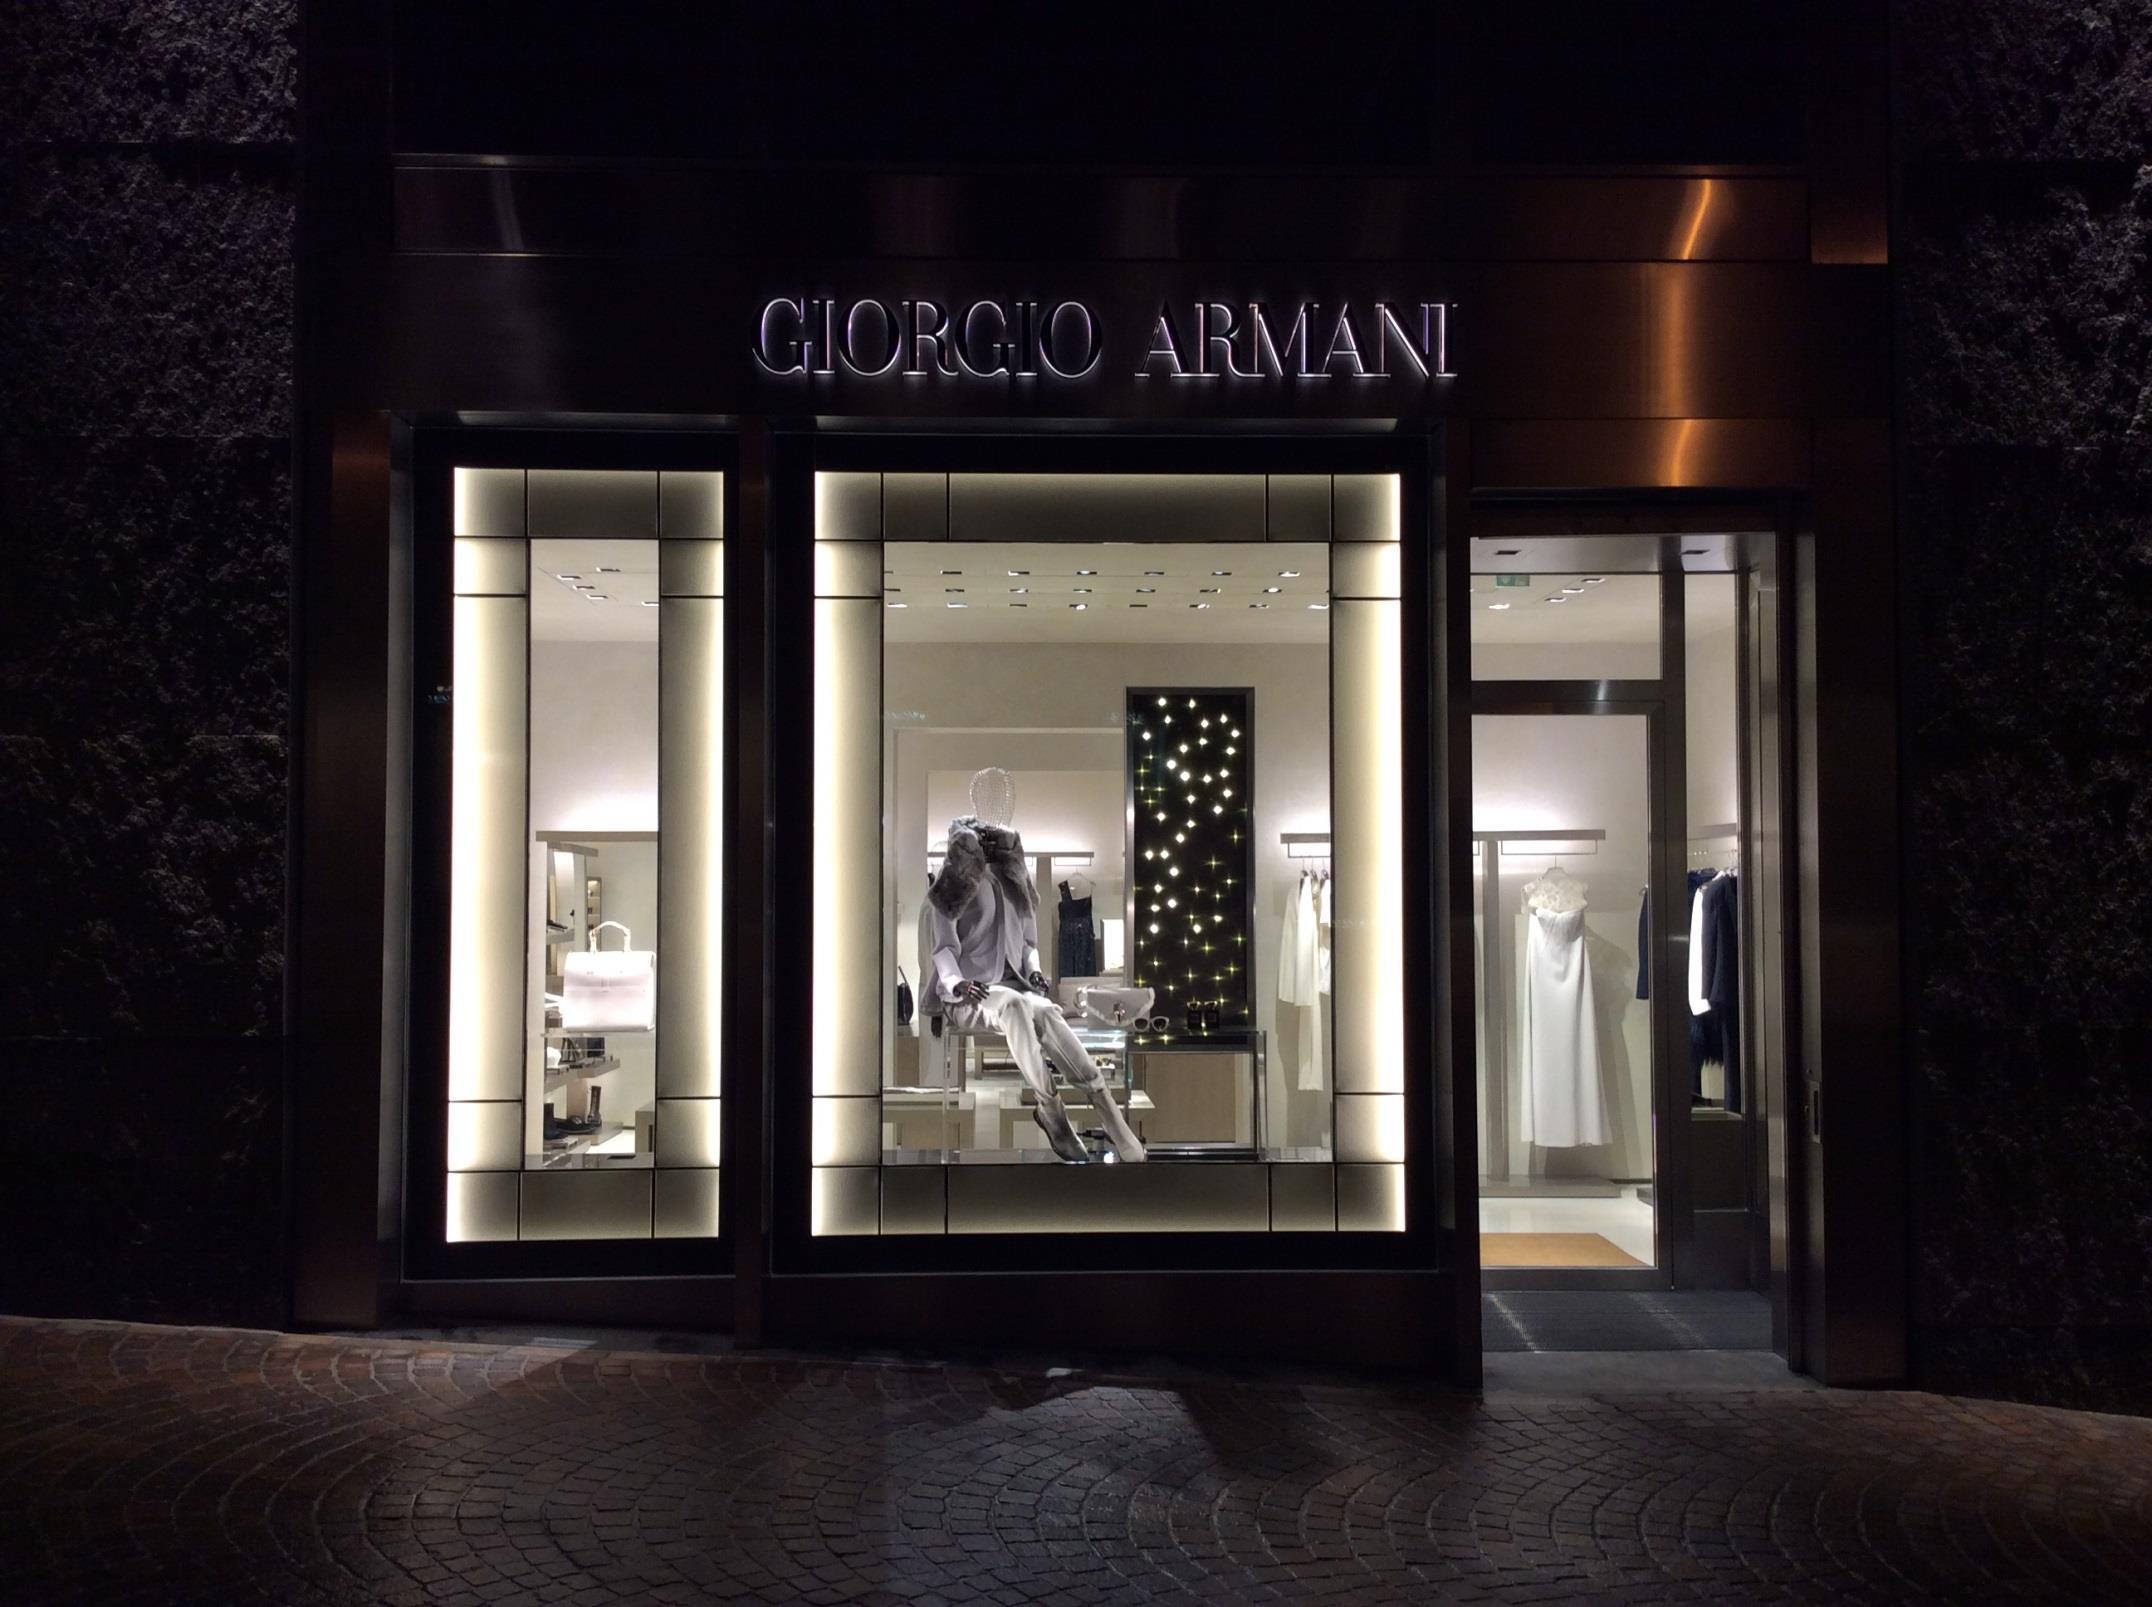 Giorgio Armani Slide 1